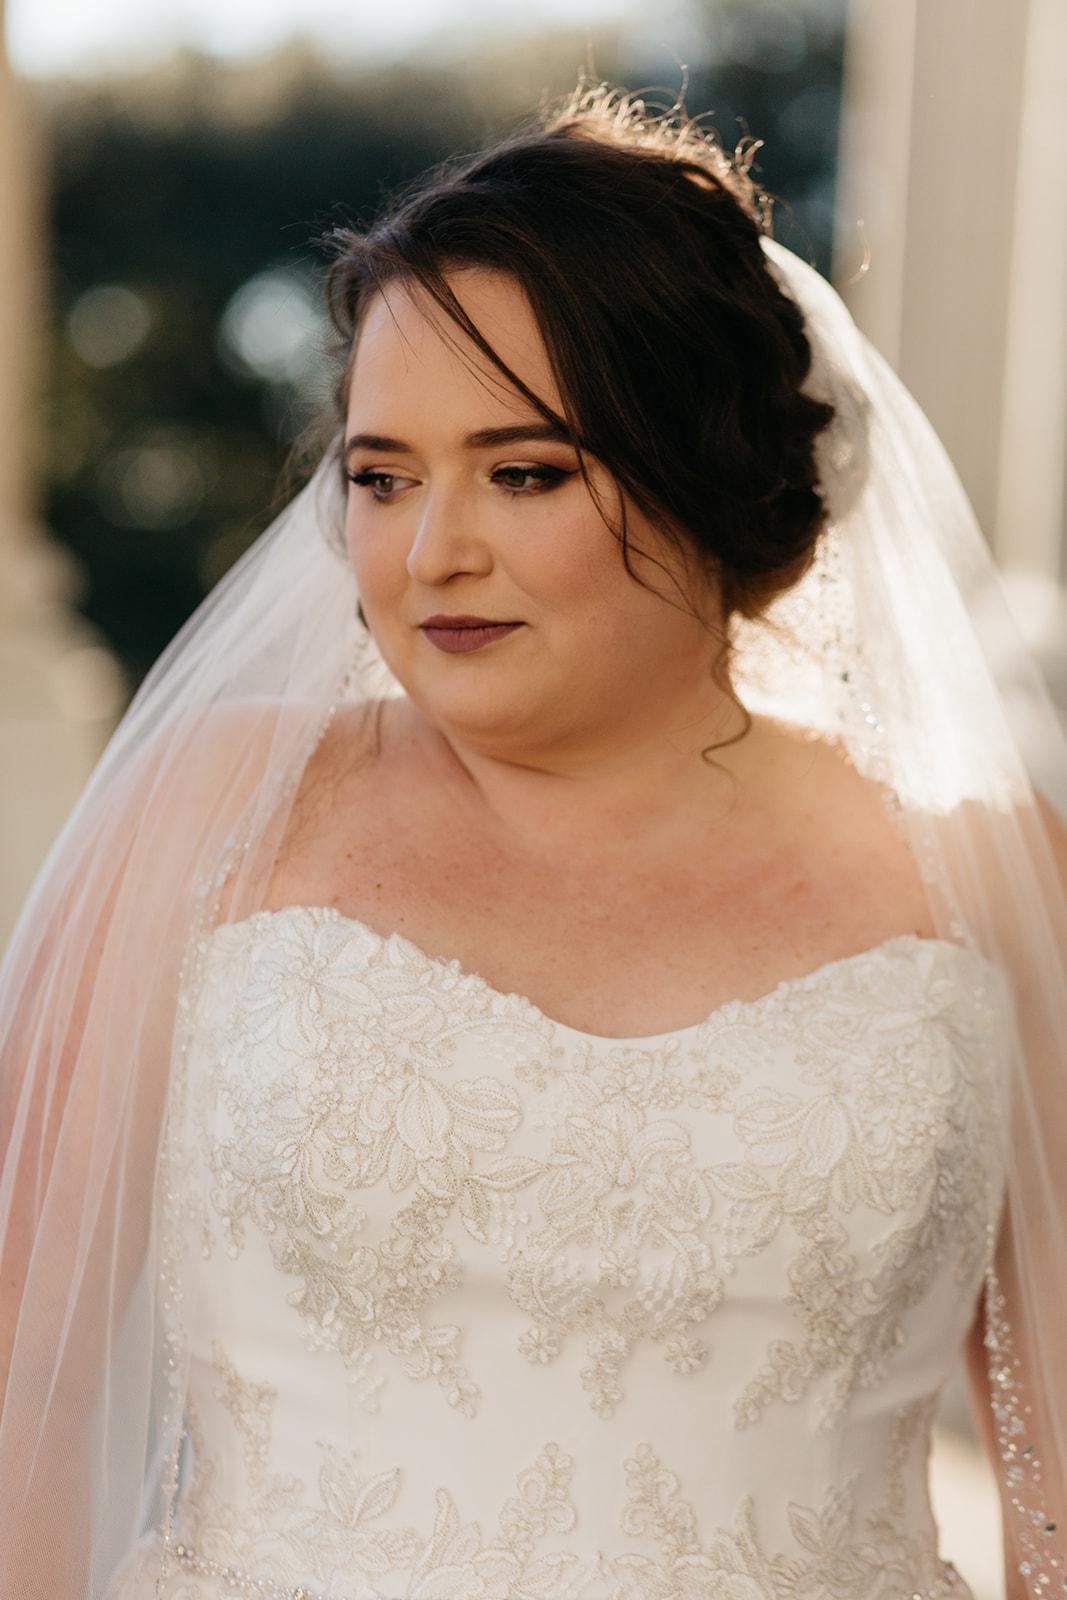 bridal portraits by south carolina wedding photography alexis schwallier-114.jpg